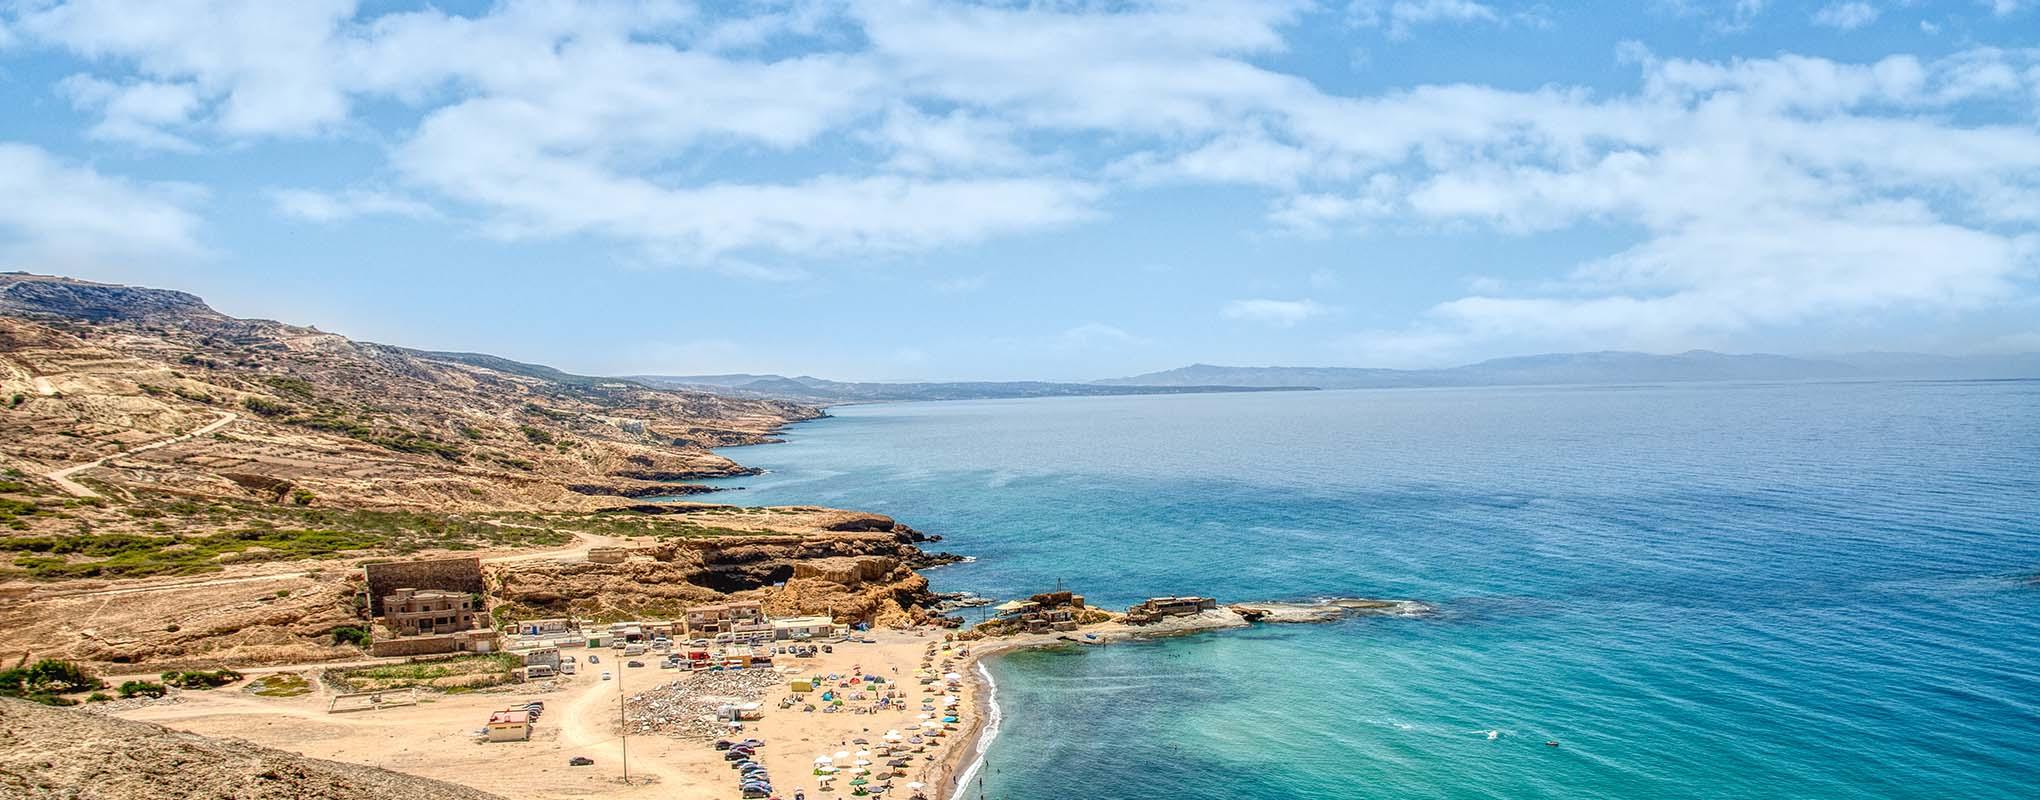 Playa Charrana en Nador